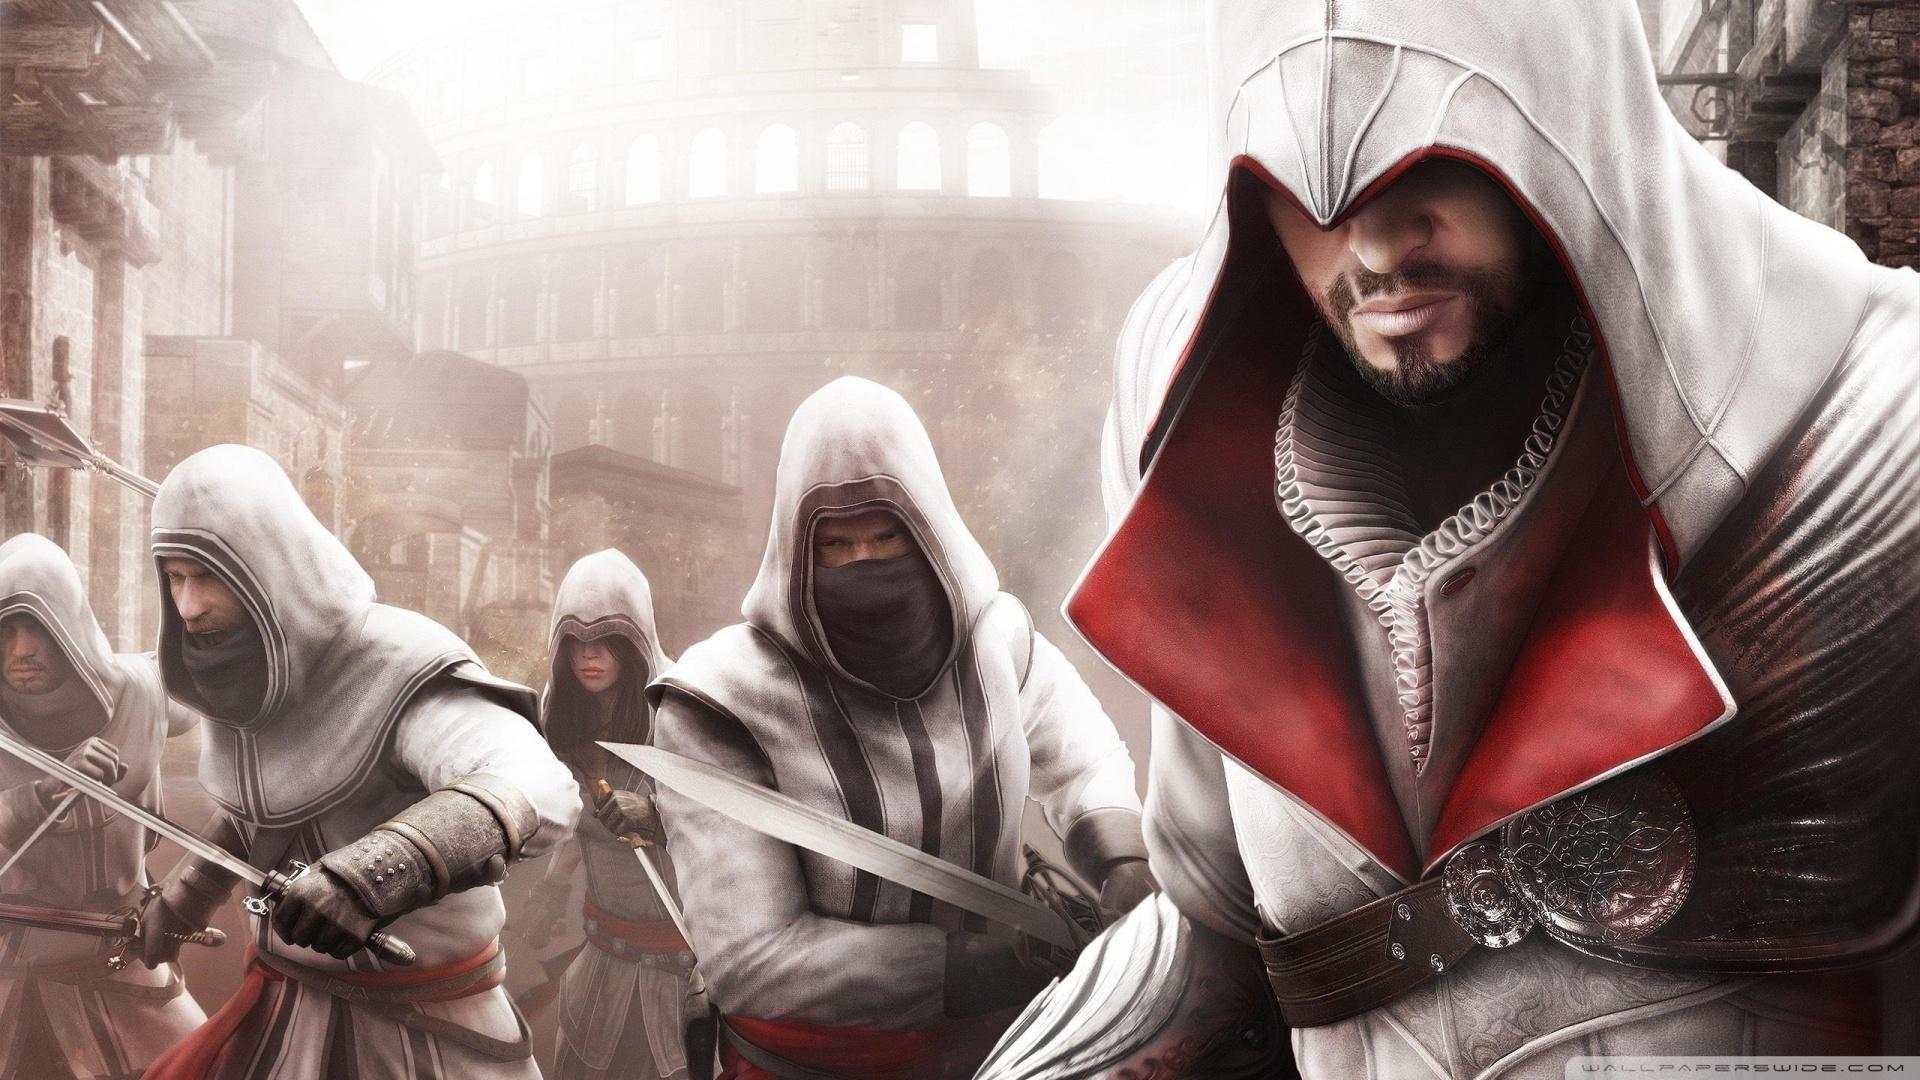 Free Download Assassins Creed Brotherhood 13 Wallpaper 1920x1080